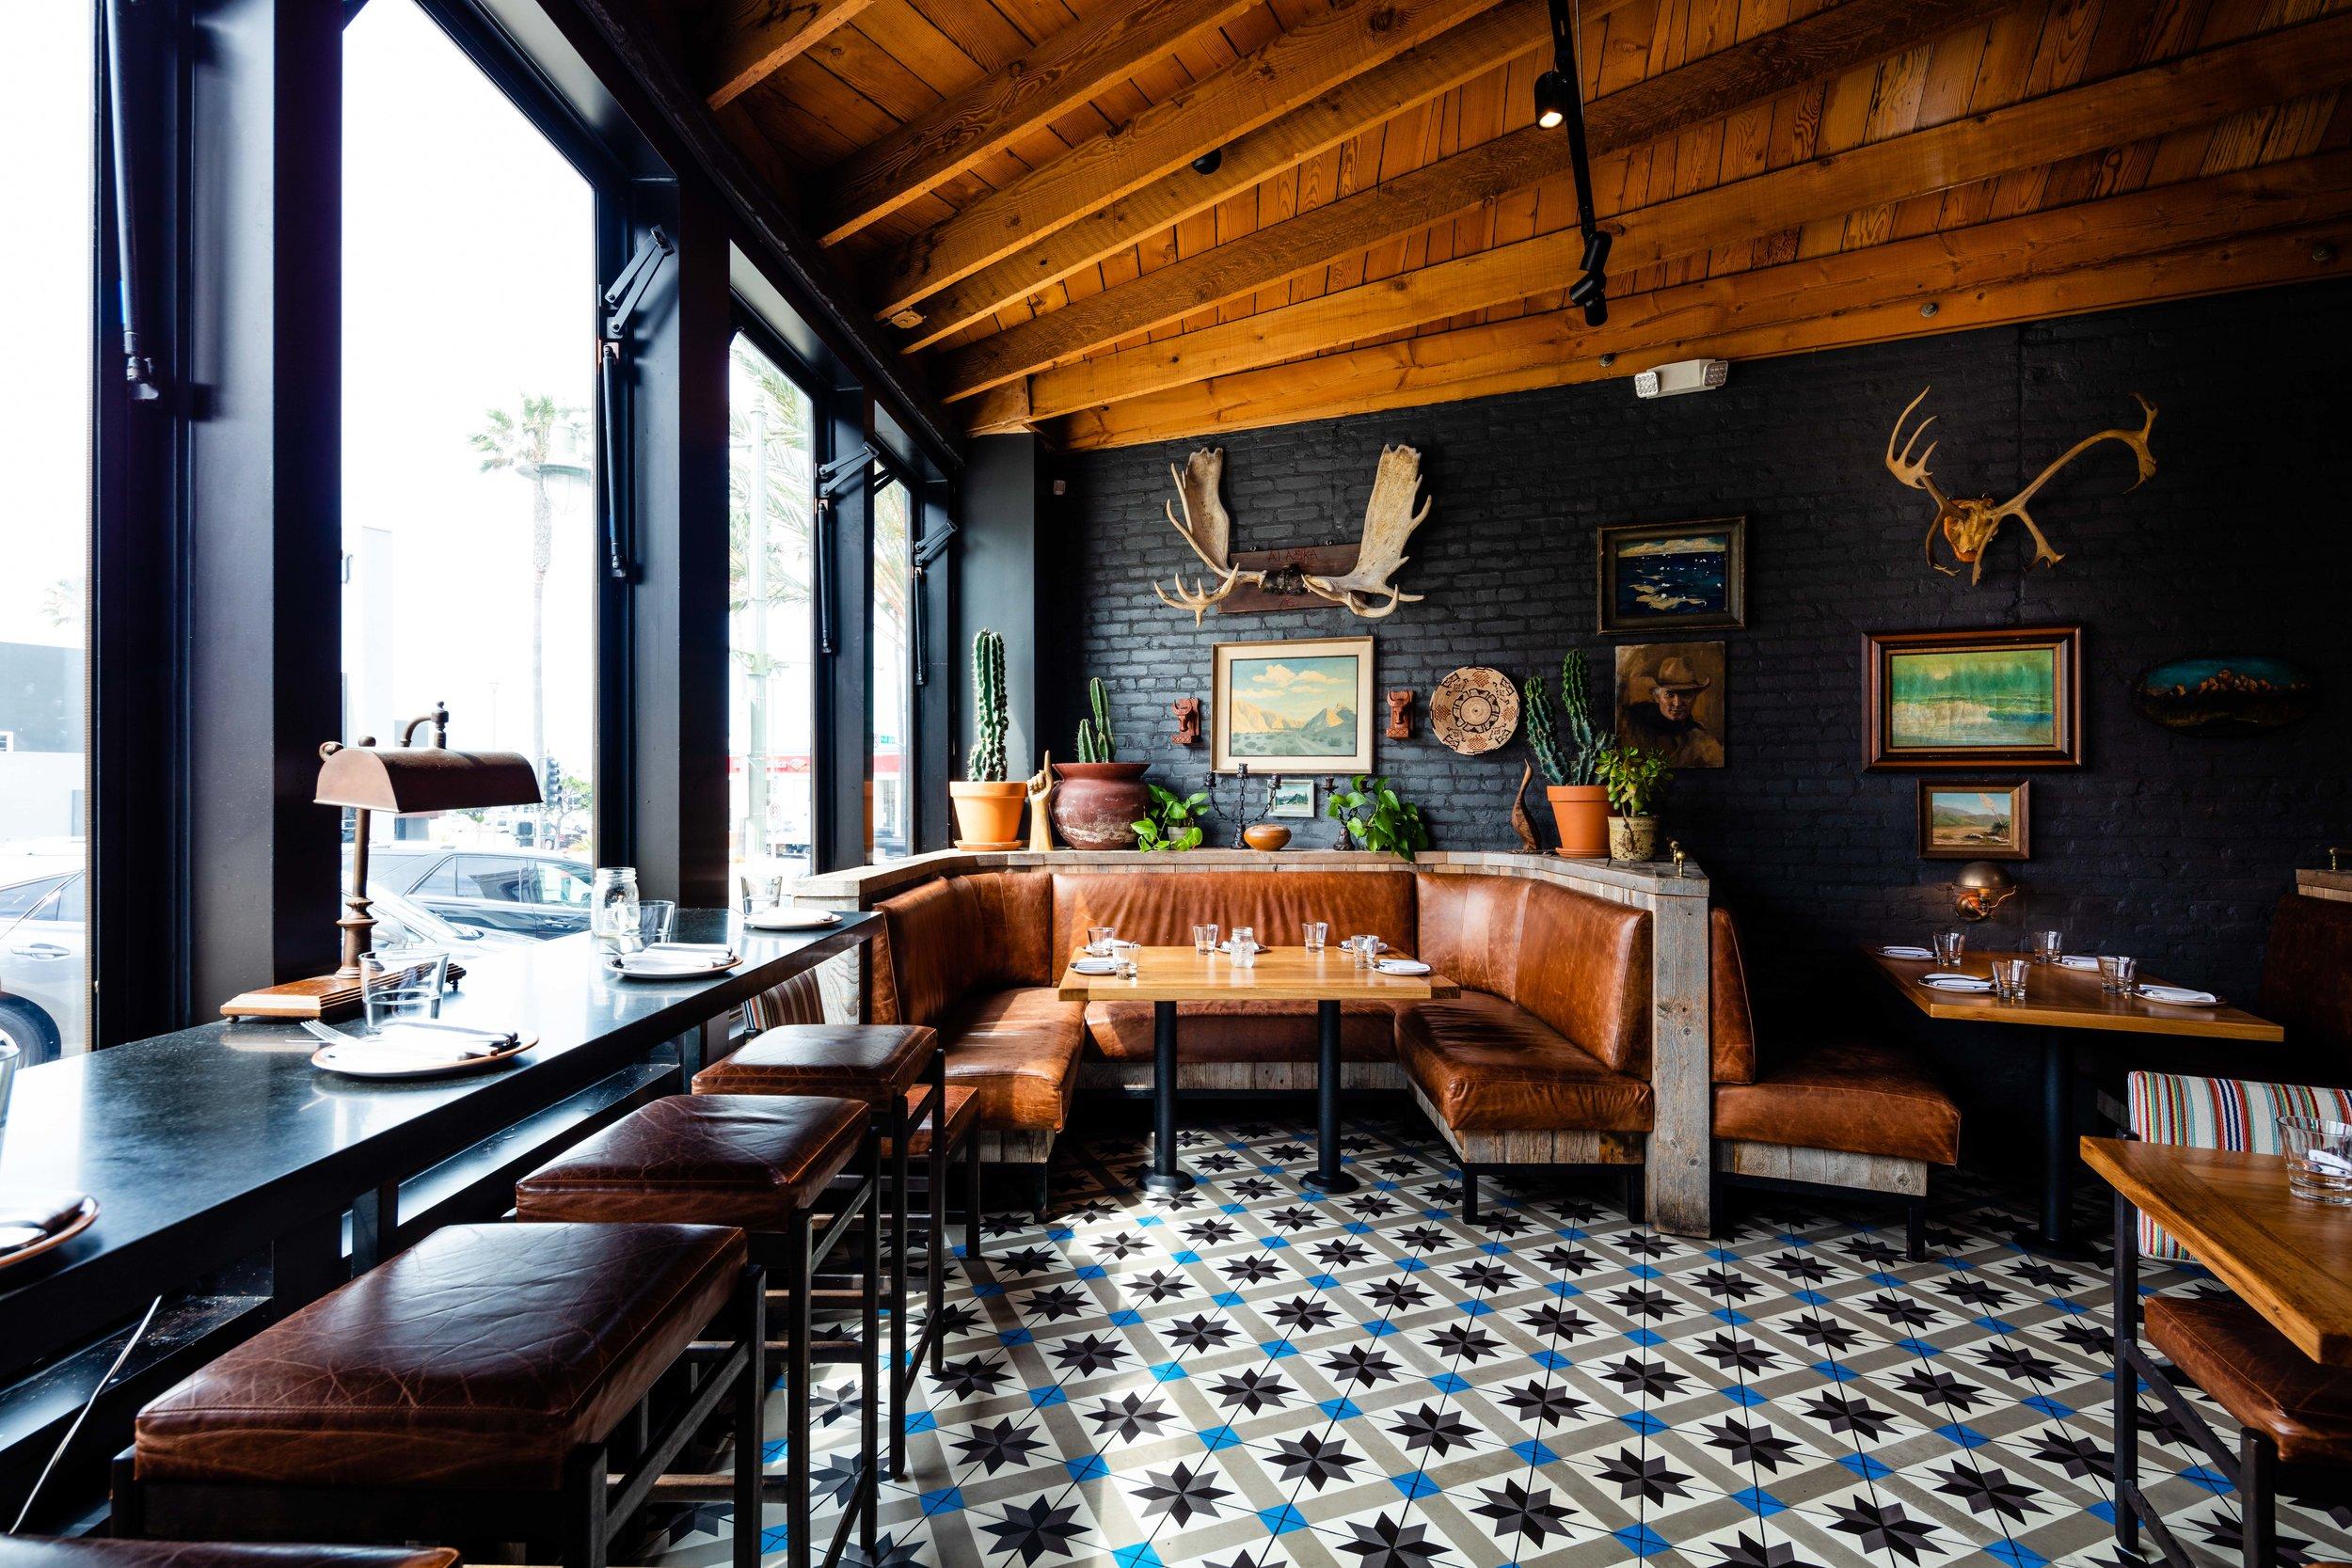 Interiors at Steak & Whisky